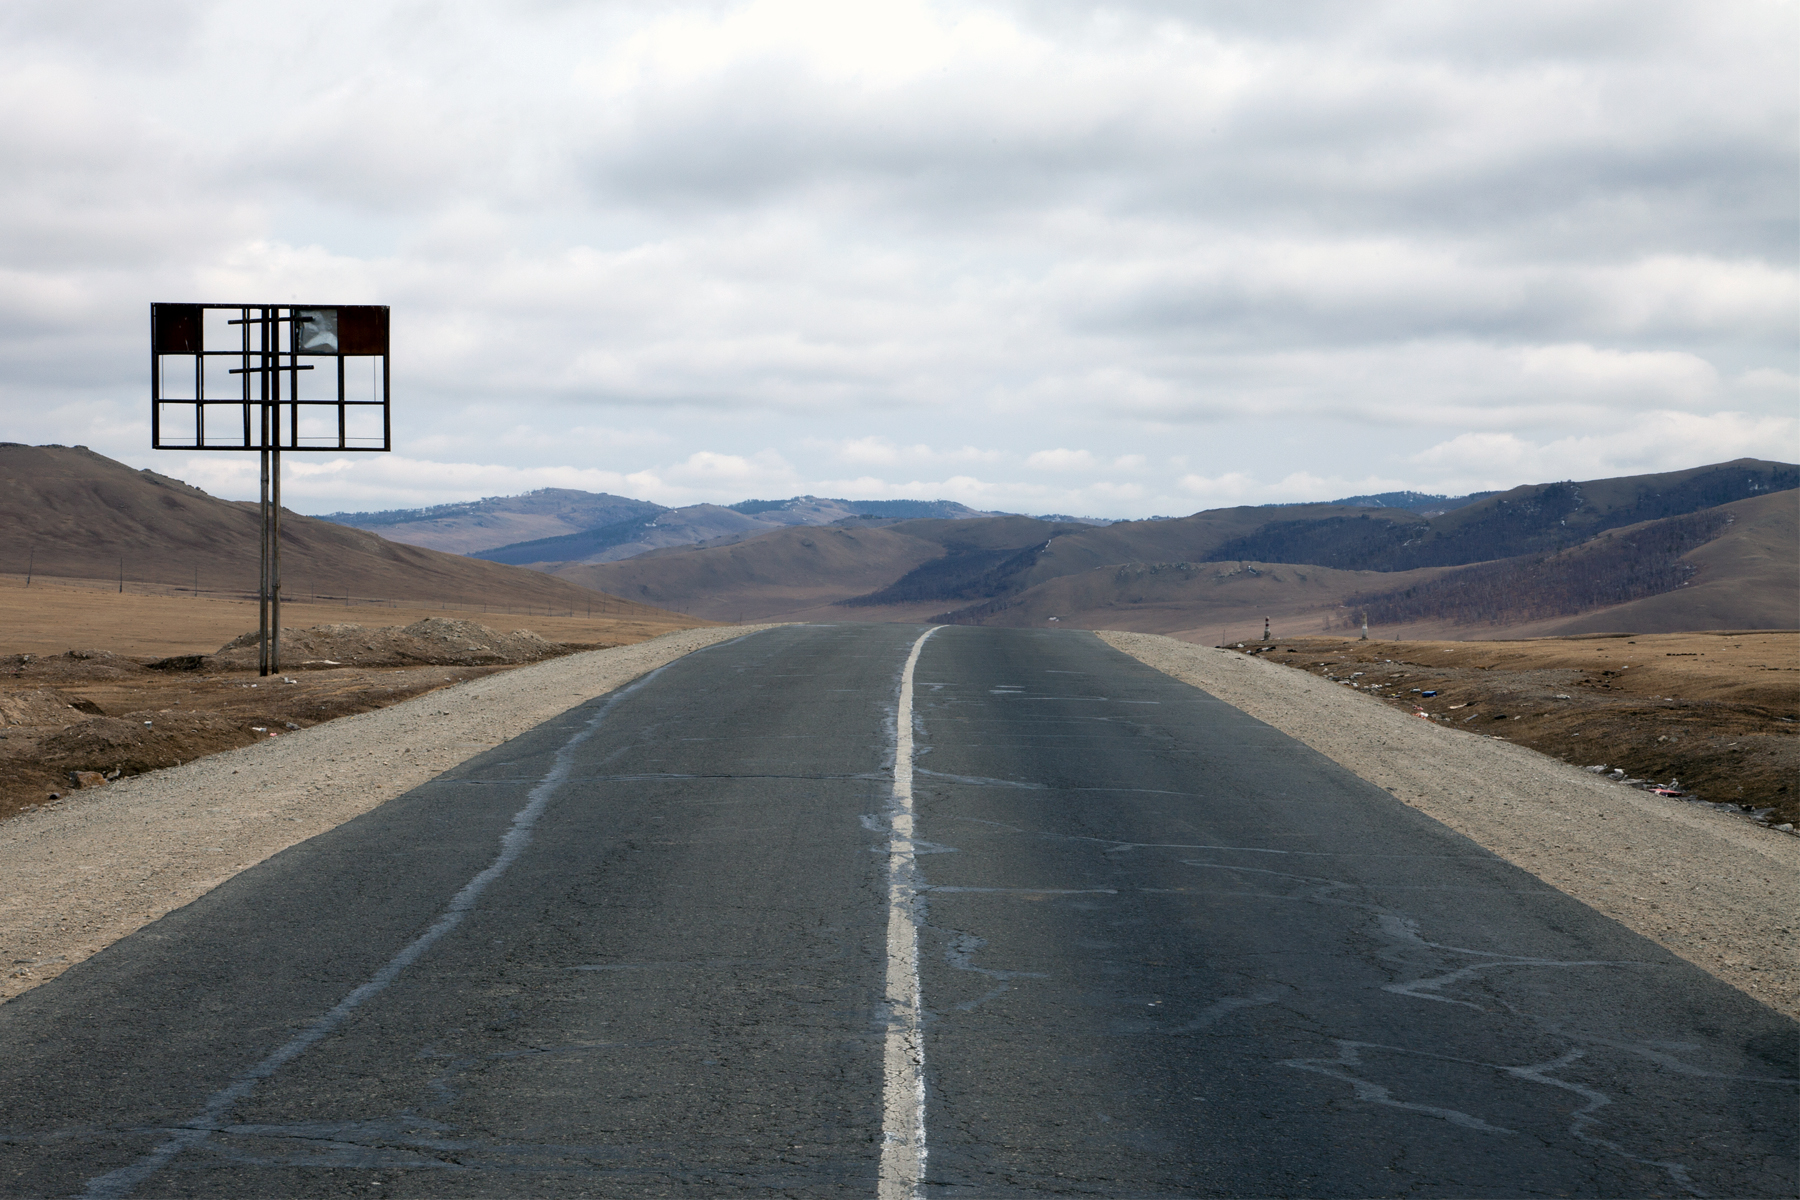 Mongolia1_6x4.jpg